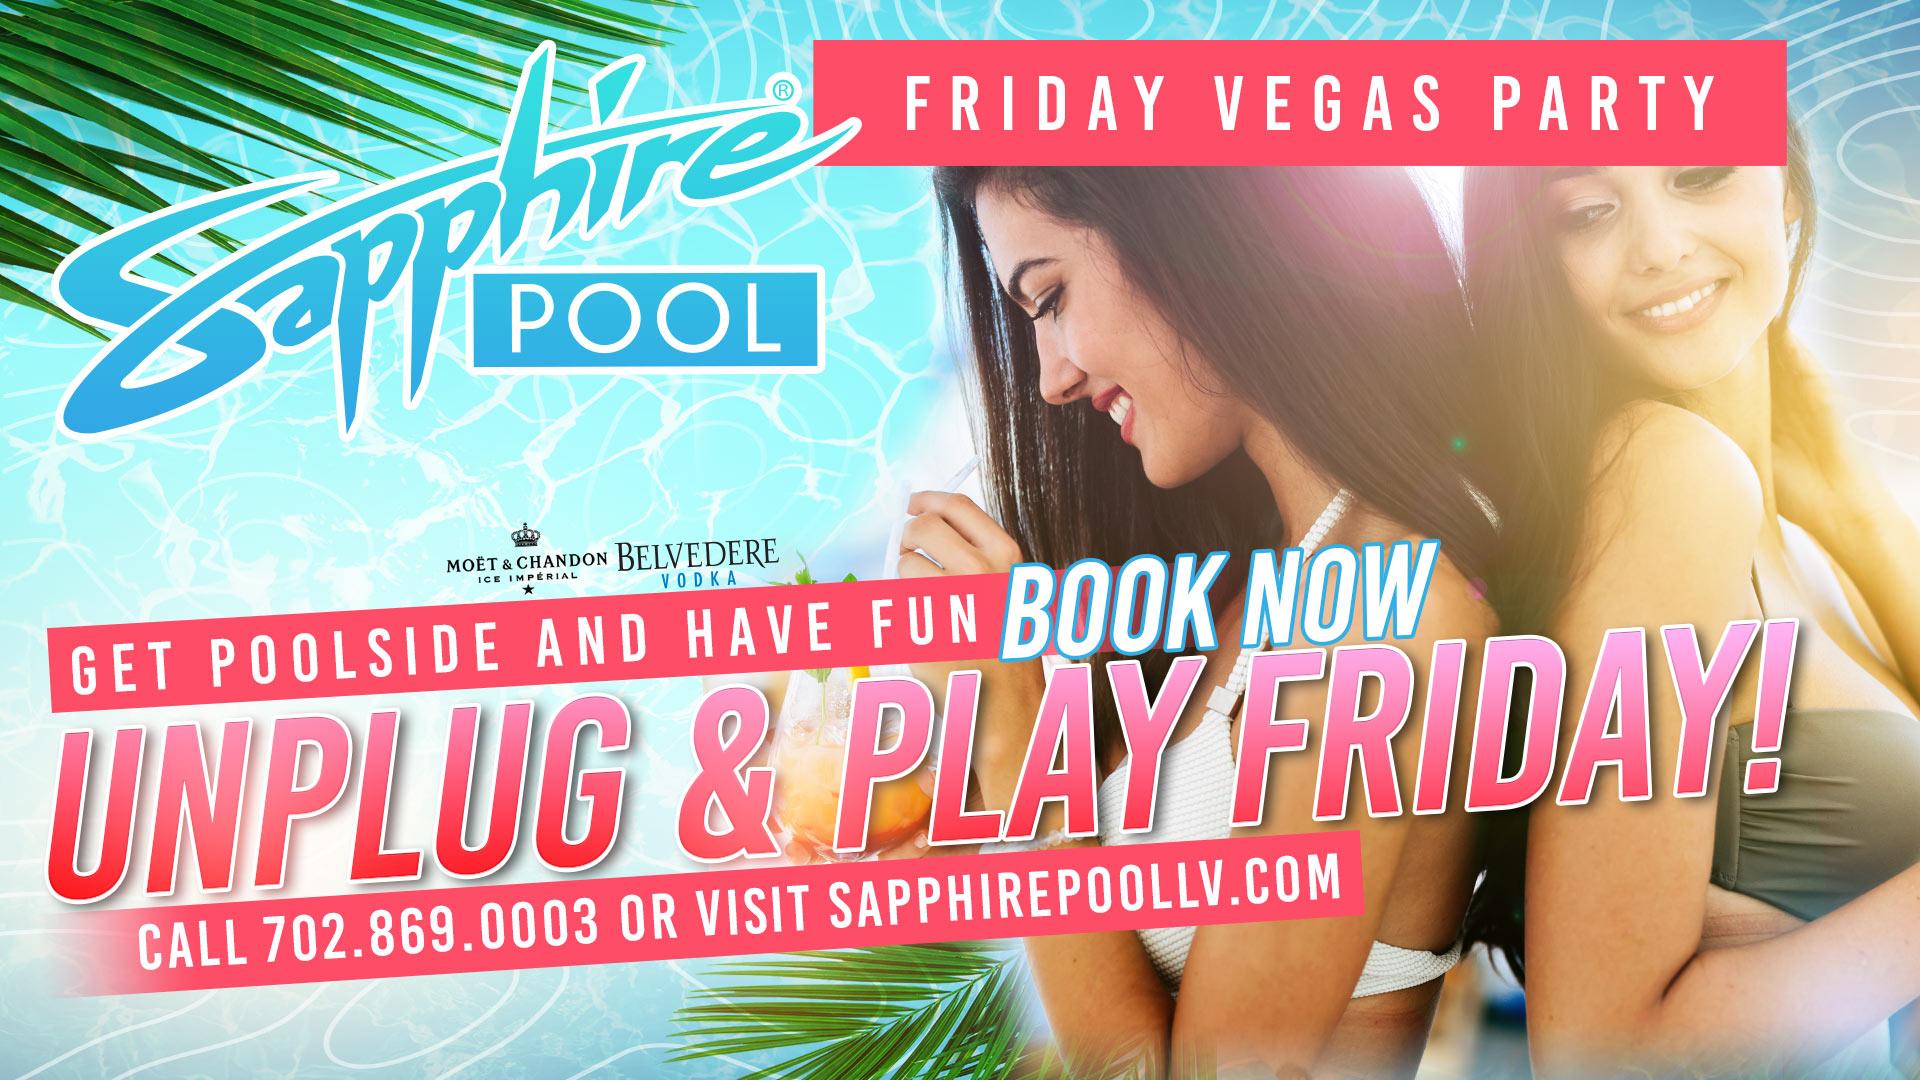 UnPlug & Play Friday at Sapphire Pool in Las Vegas